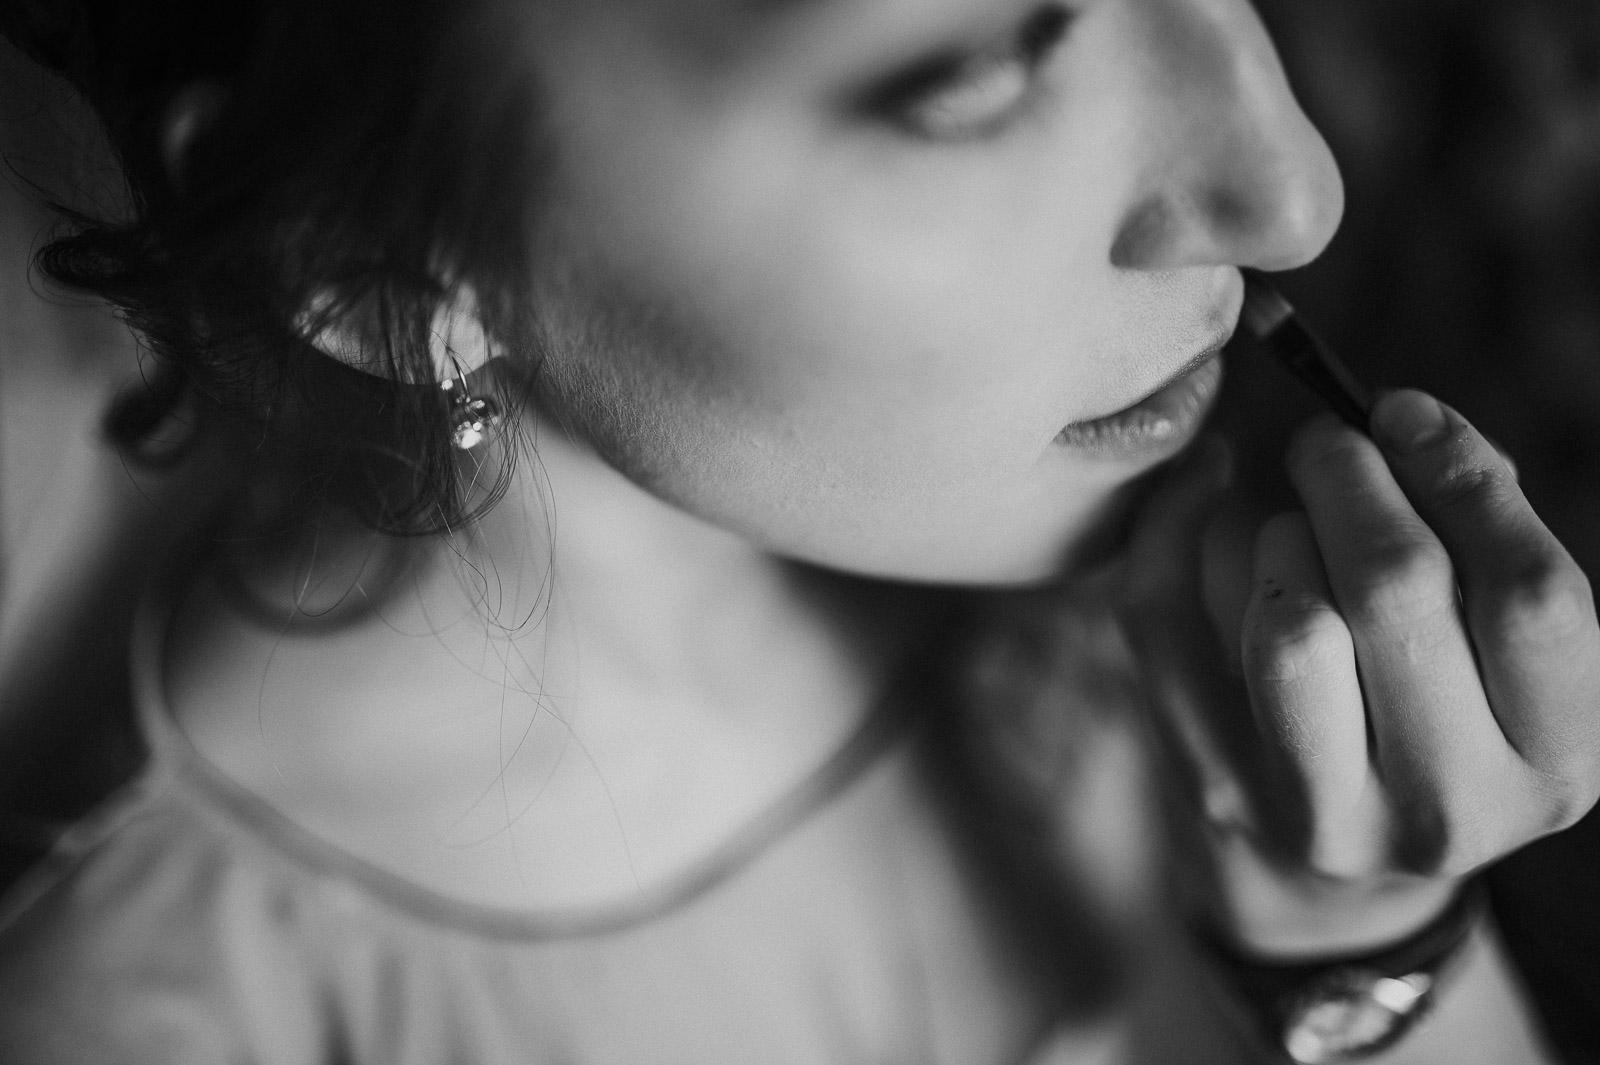 Valdur_Rosenvald_Johanna_pulmafotograaf_Mait_Juriado_M&J_Studios-018